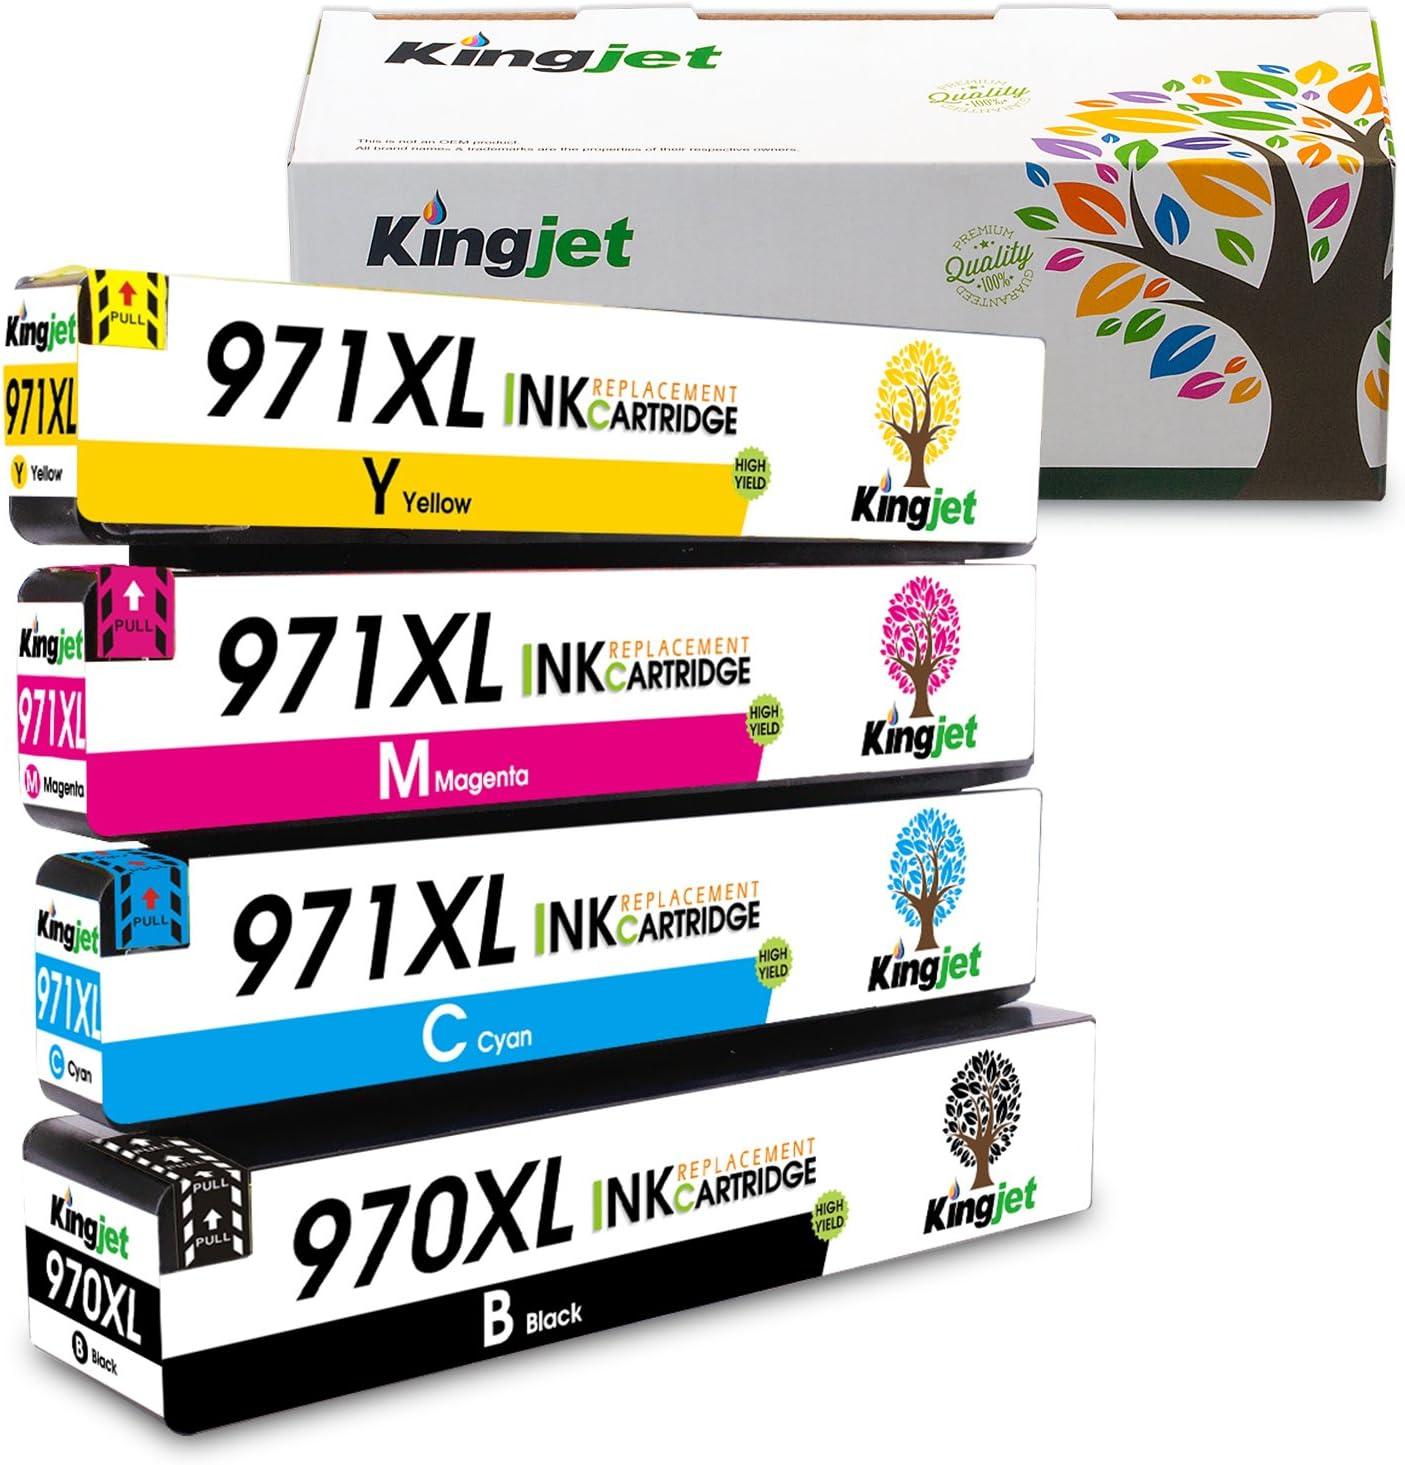 4 High Yield Ink Inkjet 970XL 971XL Set Fits HP 970 971 OfficeJet X476dw X576dw